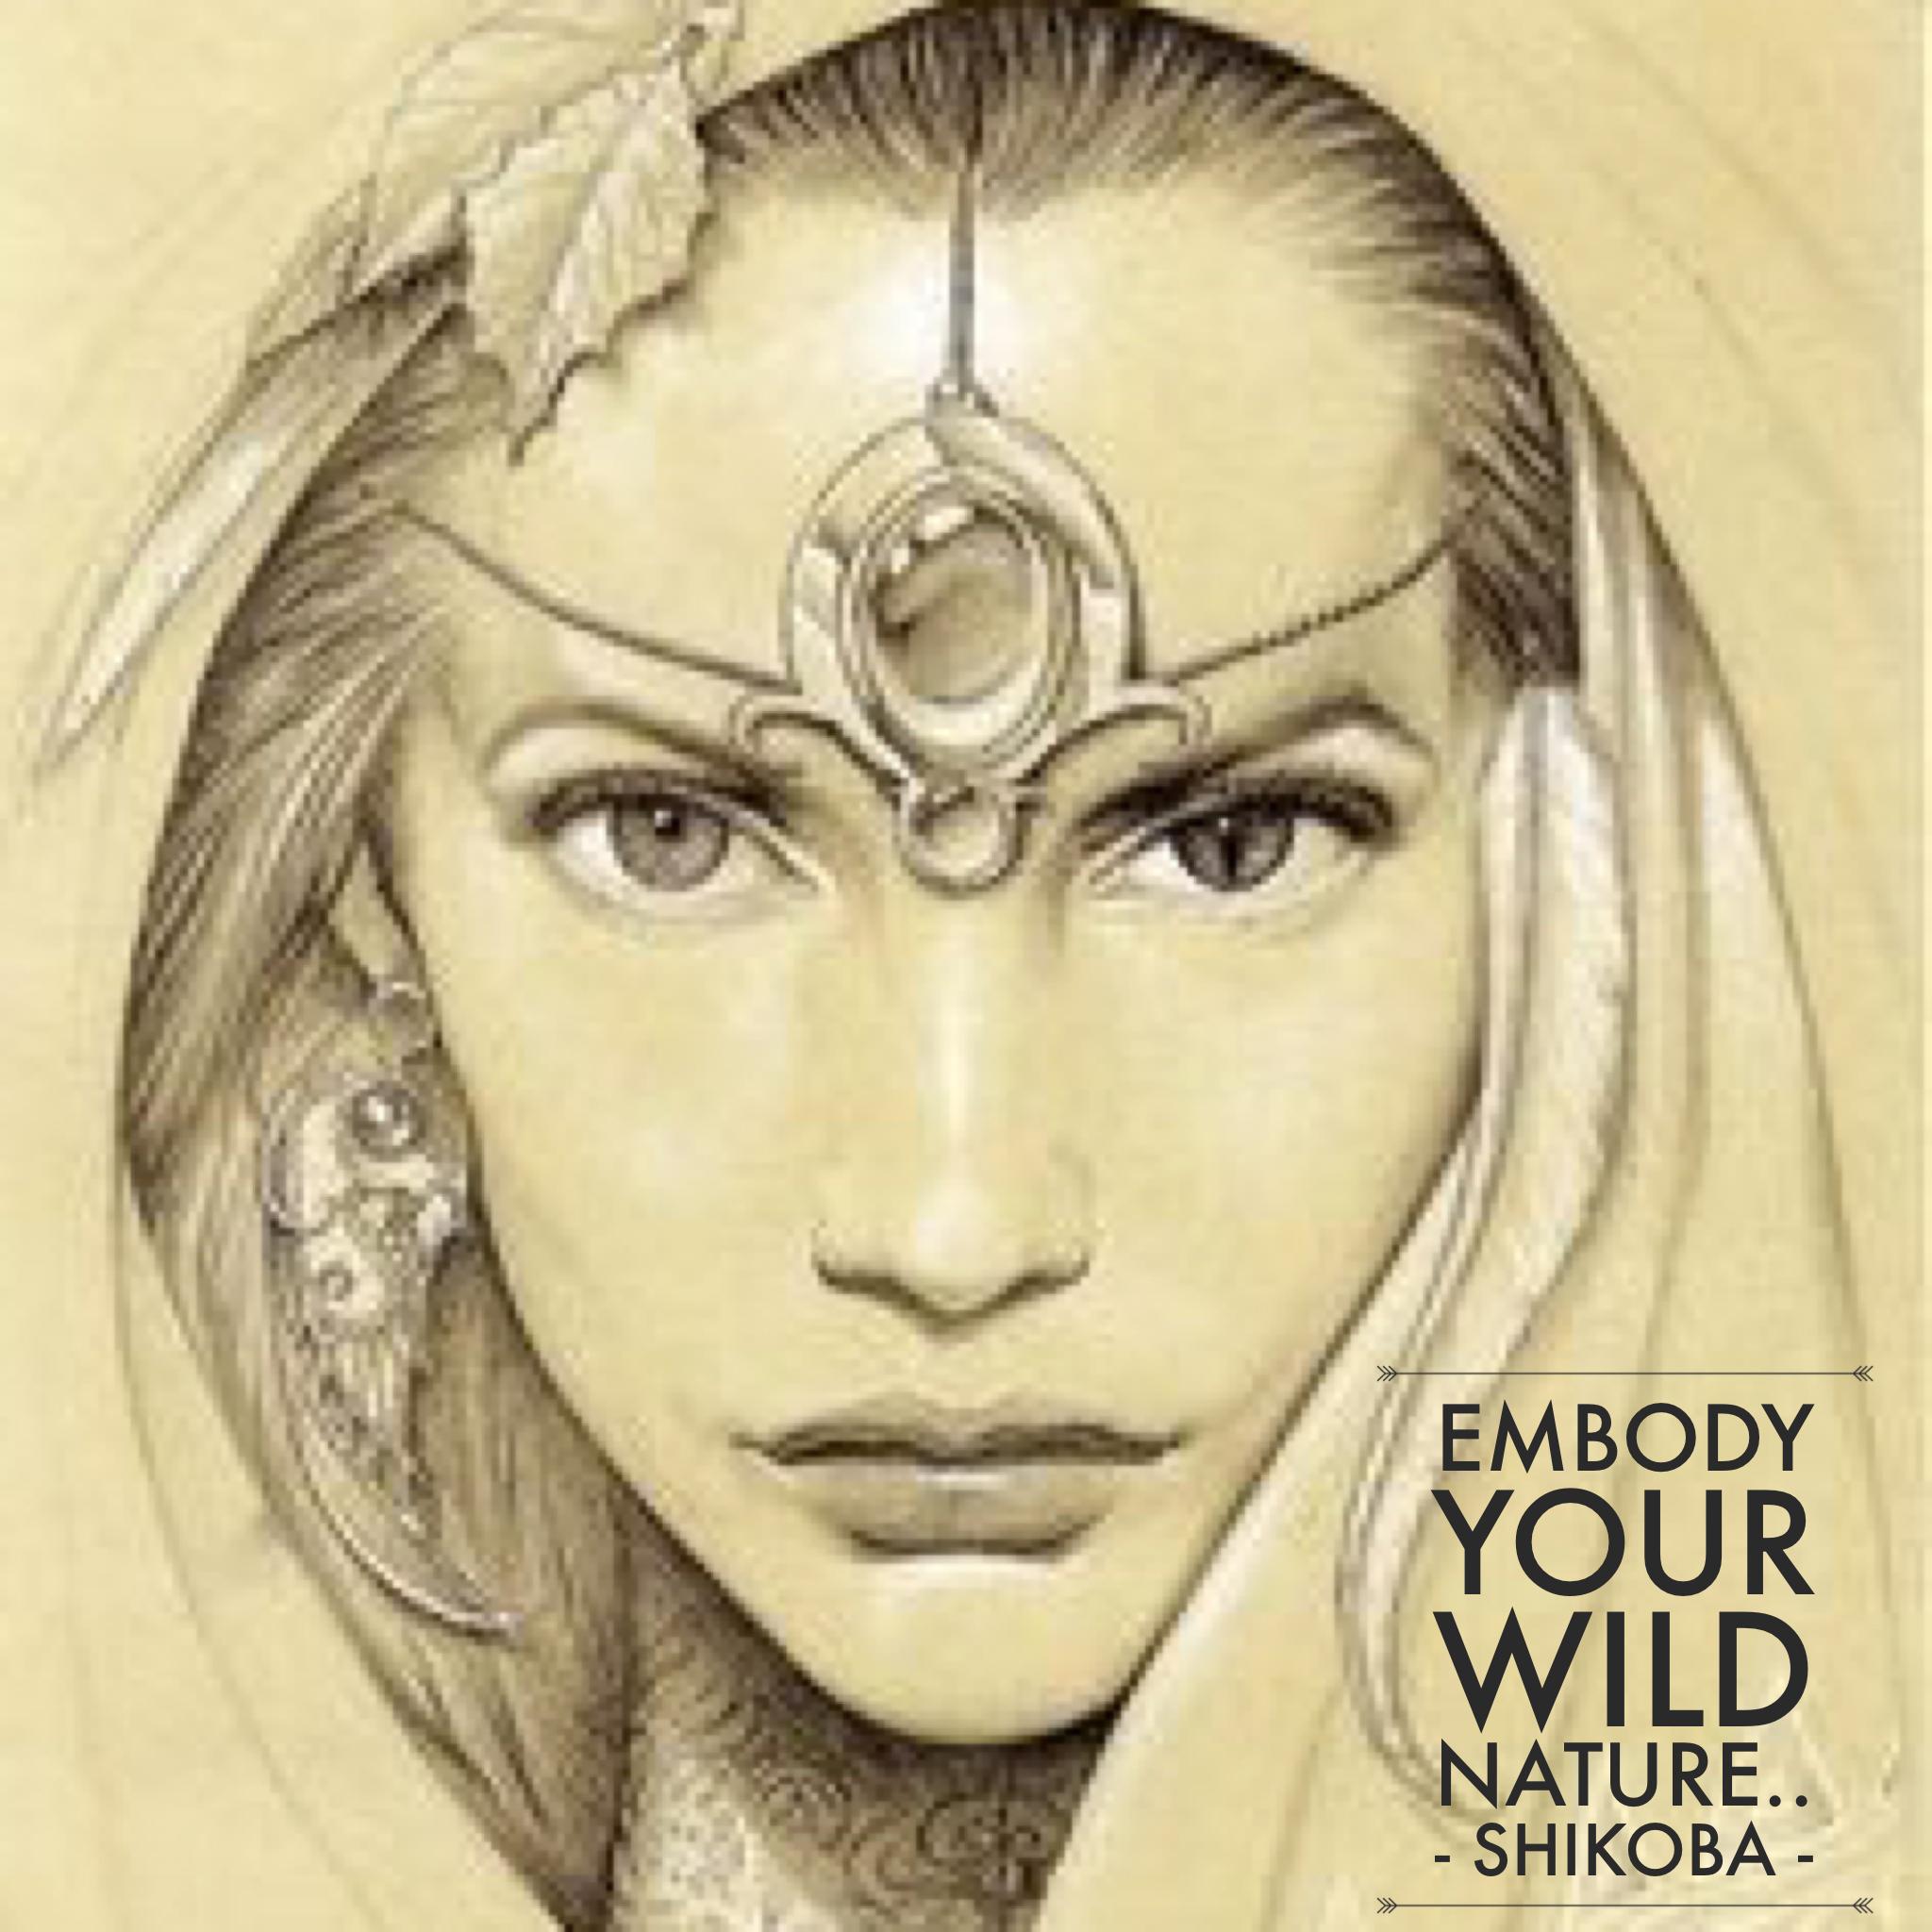 Embody your wild nature shikoba wild woman sisterhoodॐ